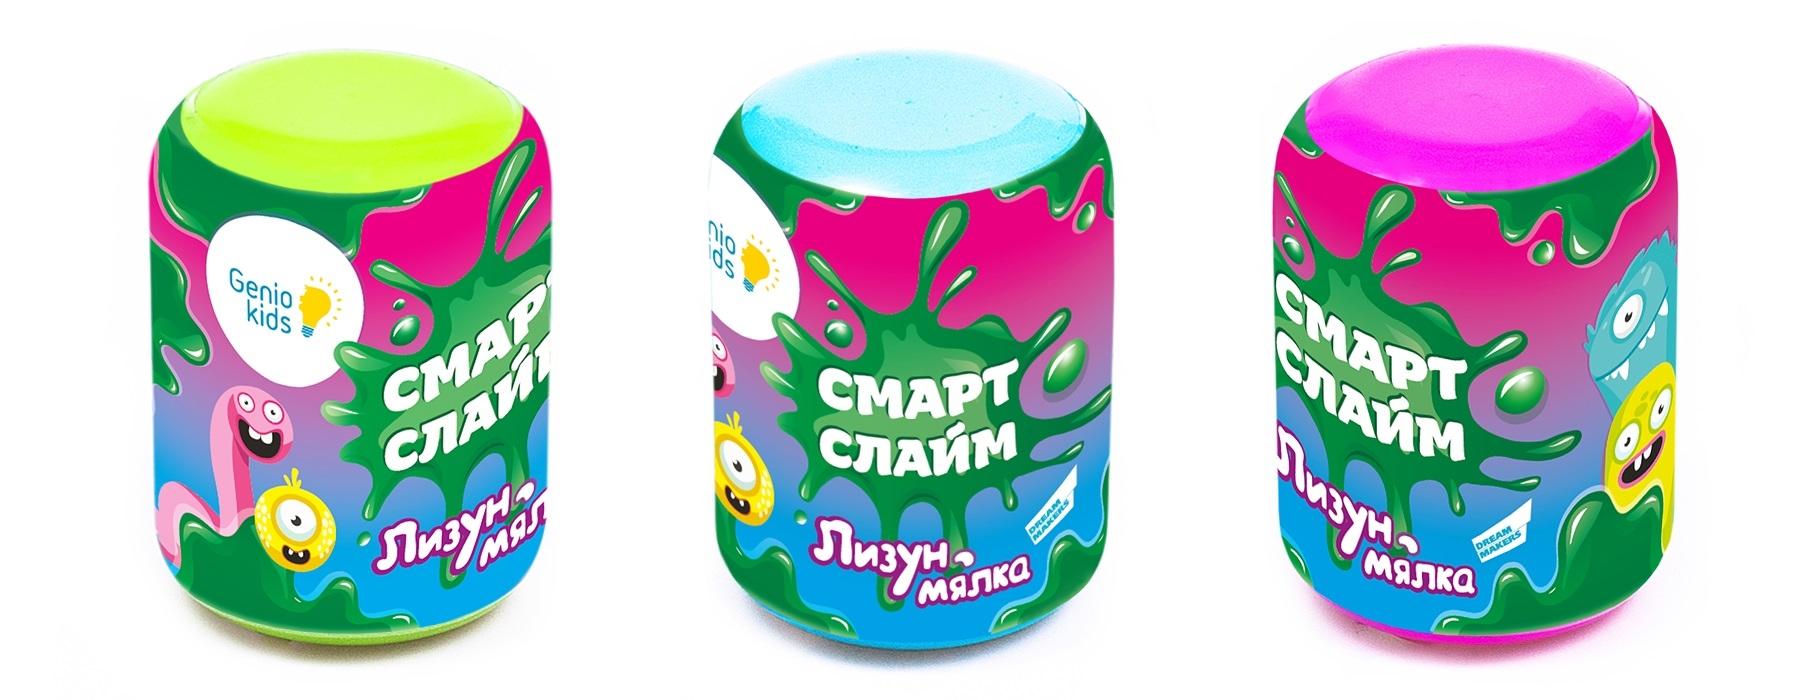 цены Наборы для творчества Genio kids Лизун Genio Kids-Art «Лизун-мялка»